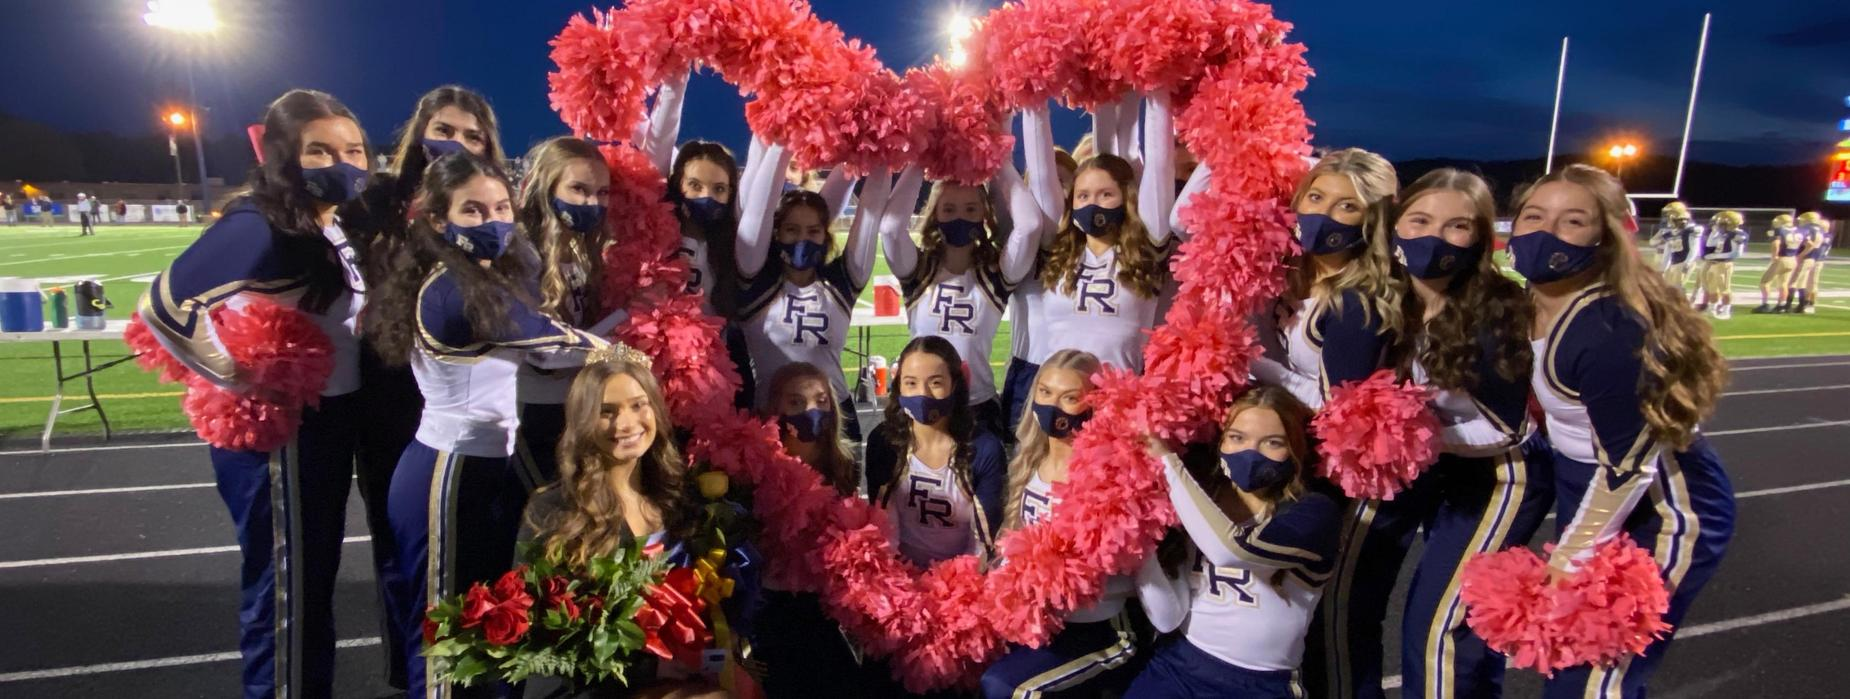 FR Cheer Squad